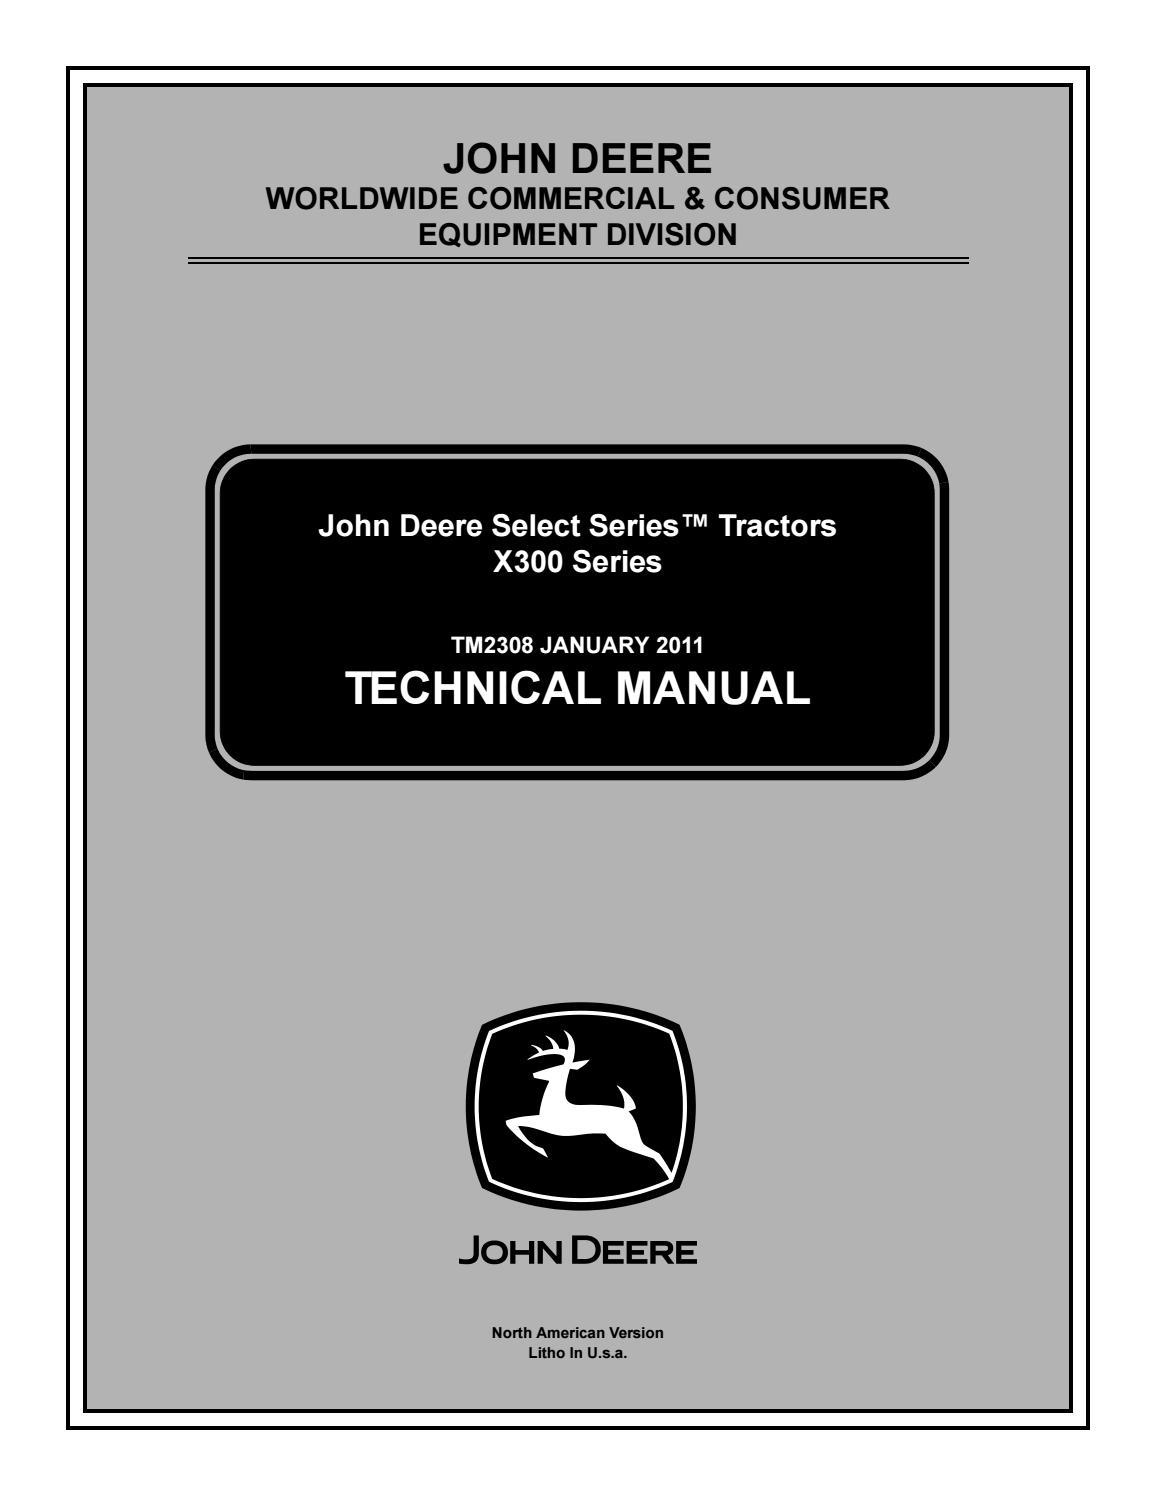 JOHN DEERE X304 LAWN TRACTOR Service Repair Manual by 163114103 - issuu | X300 Wiring Diagram |  | Issuu